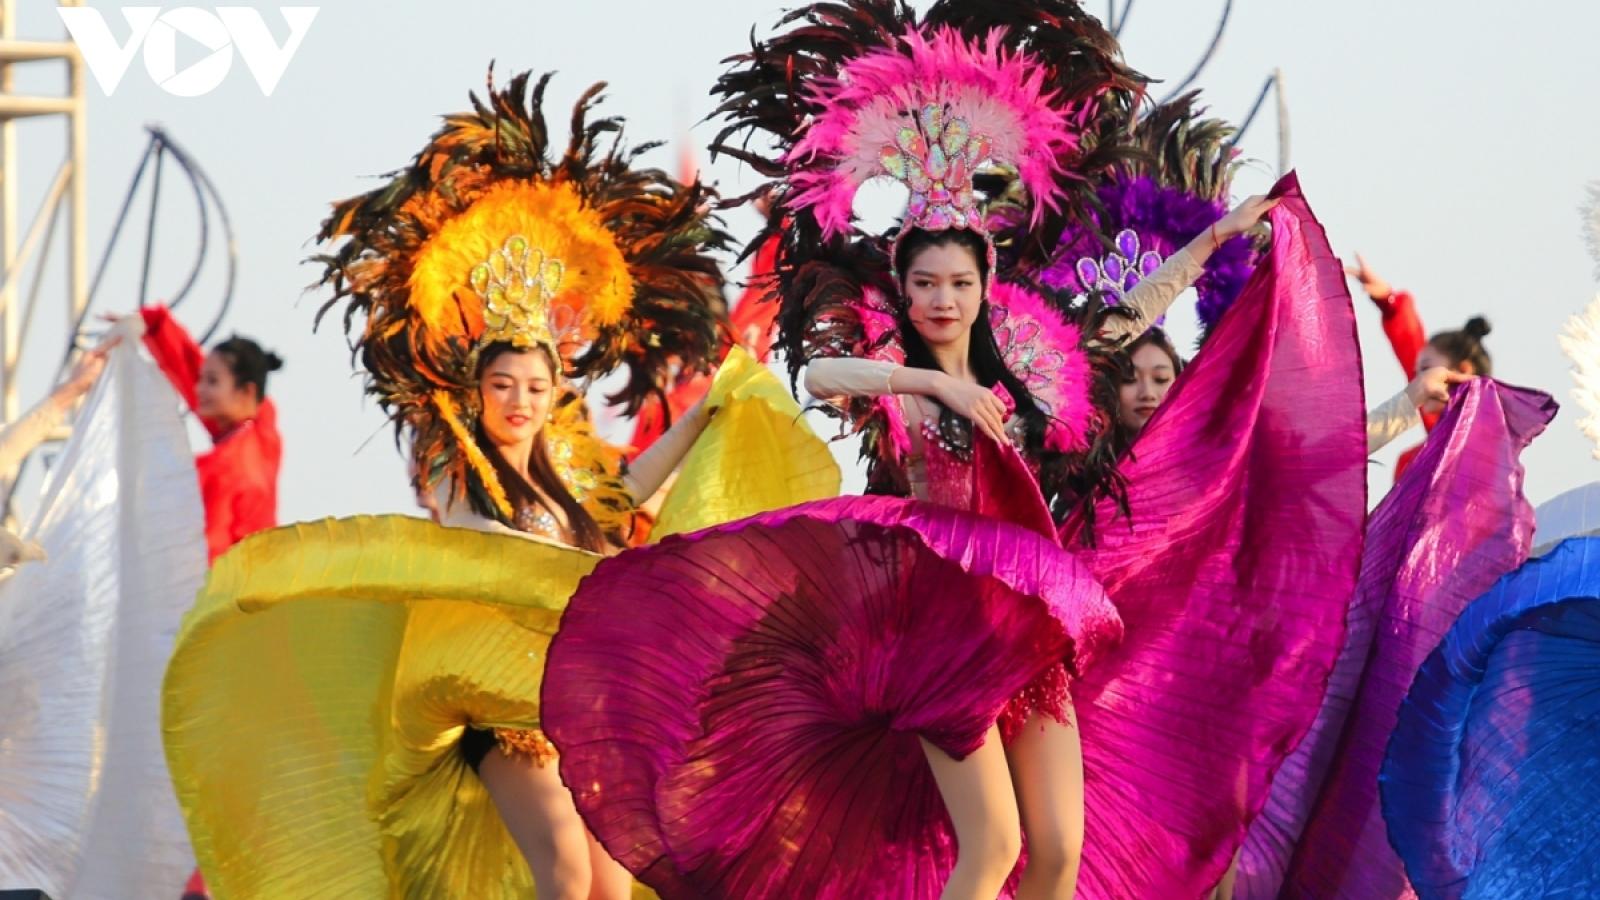 Huge crowds gather to enjoy Ha Long winter carnival